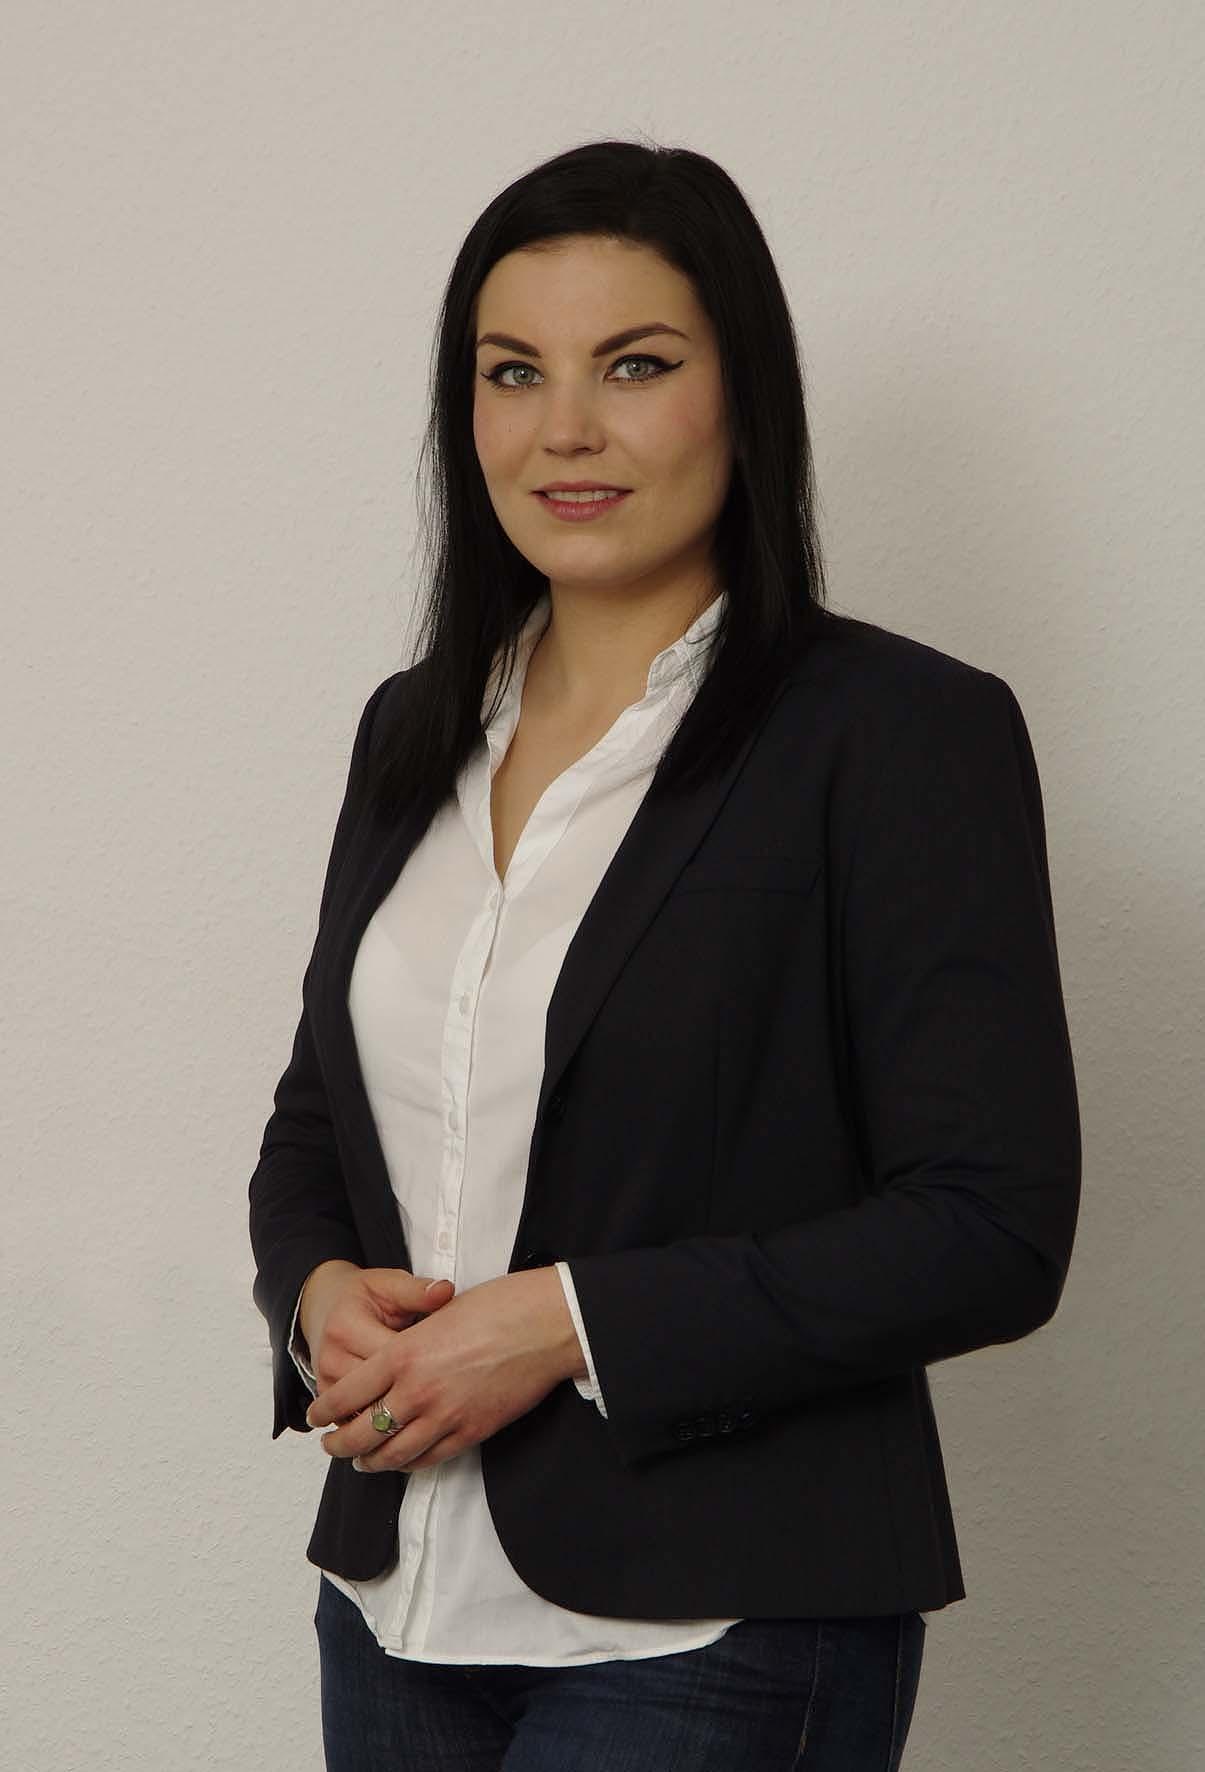 Karina Wiebusch